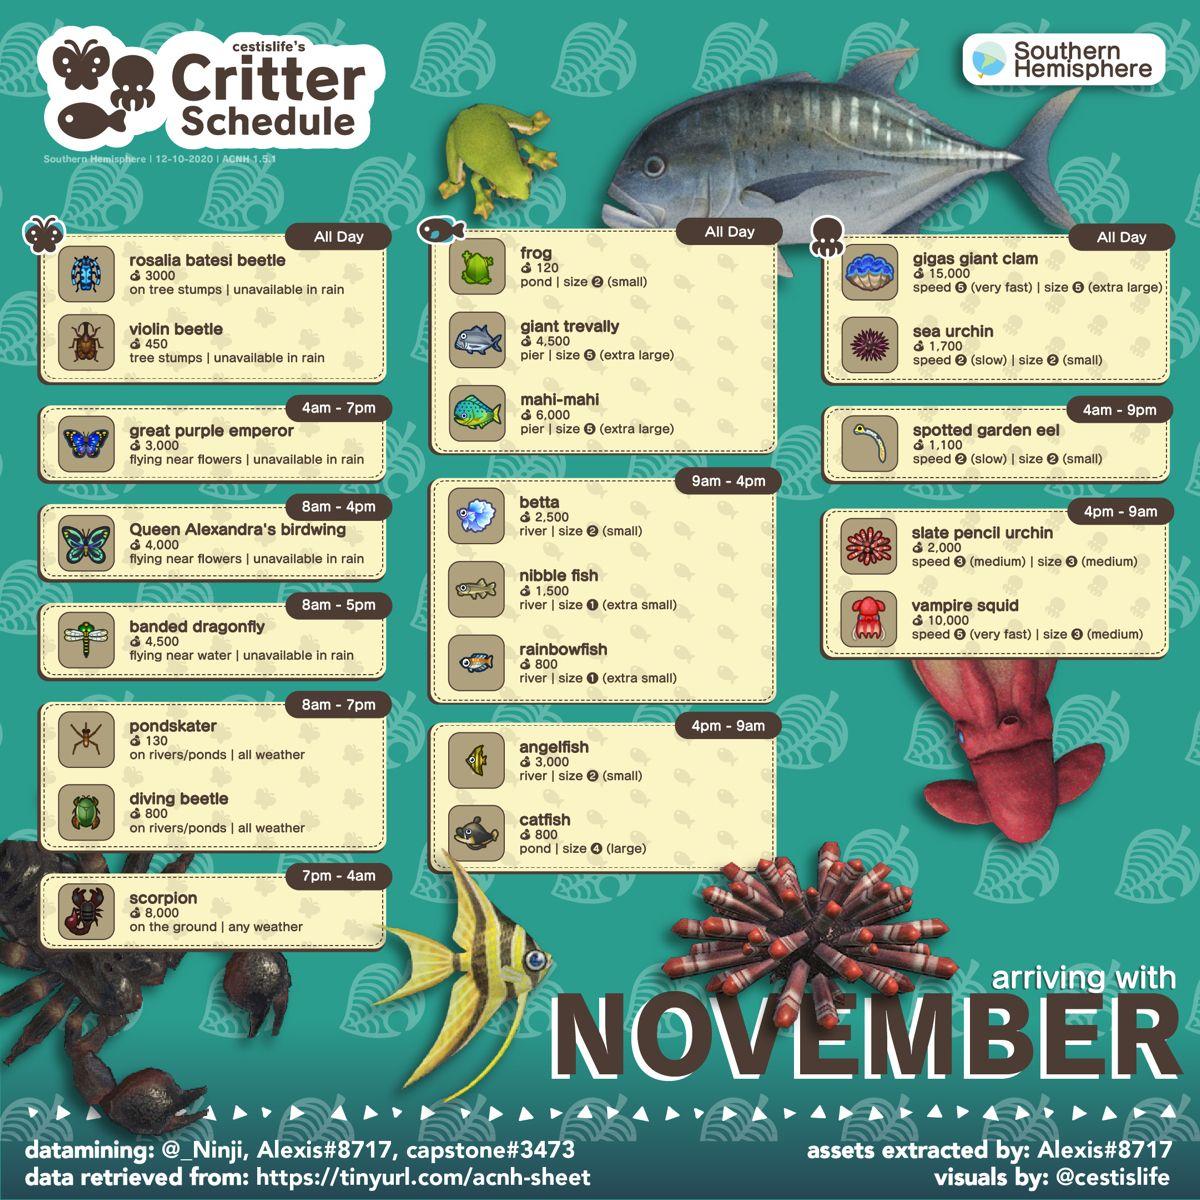 November Critters Update By Cestislife Animal Crossing Fish Animal Crossing Guide Animal Crossing